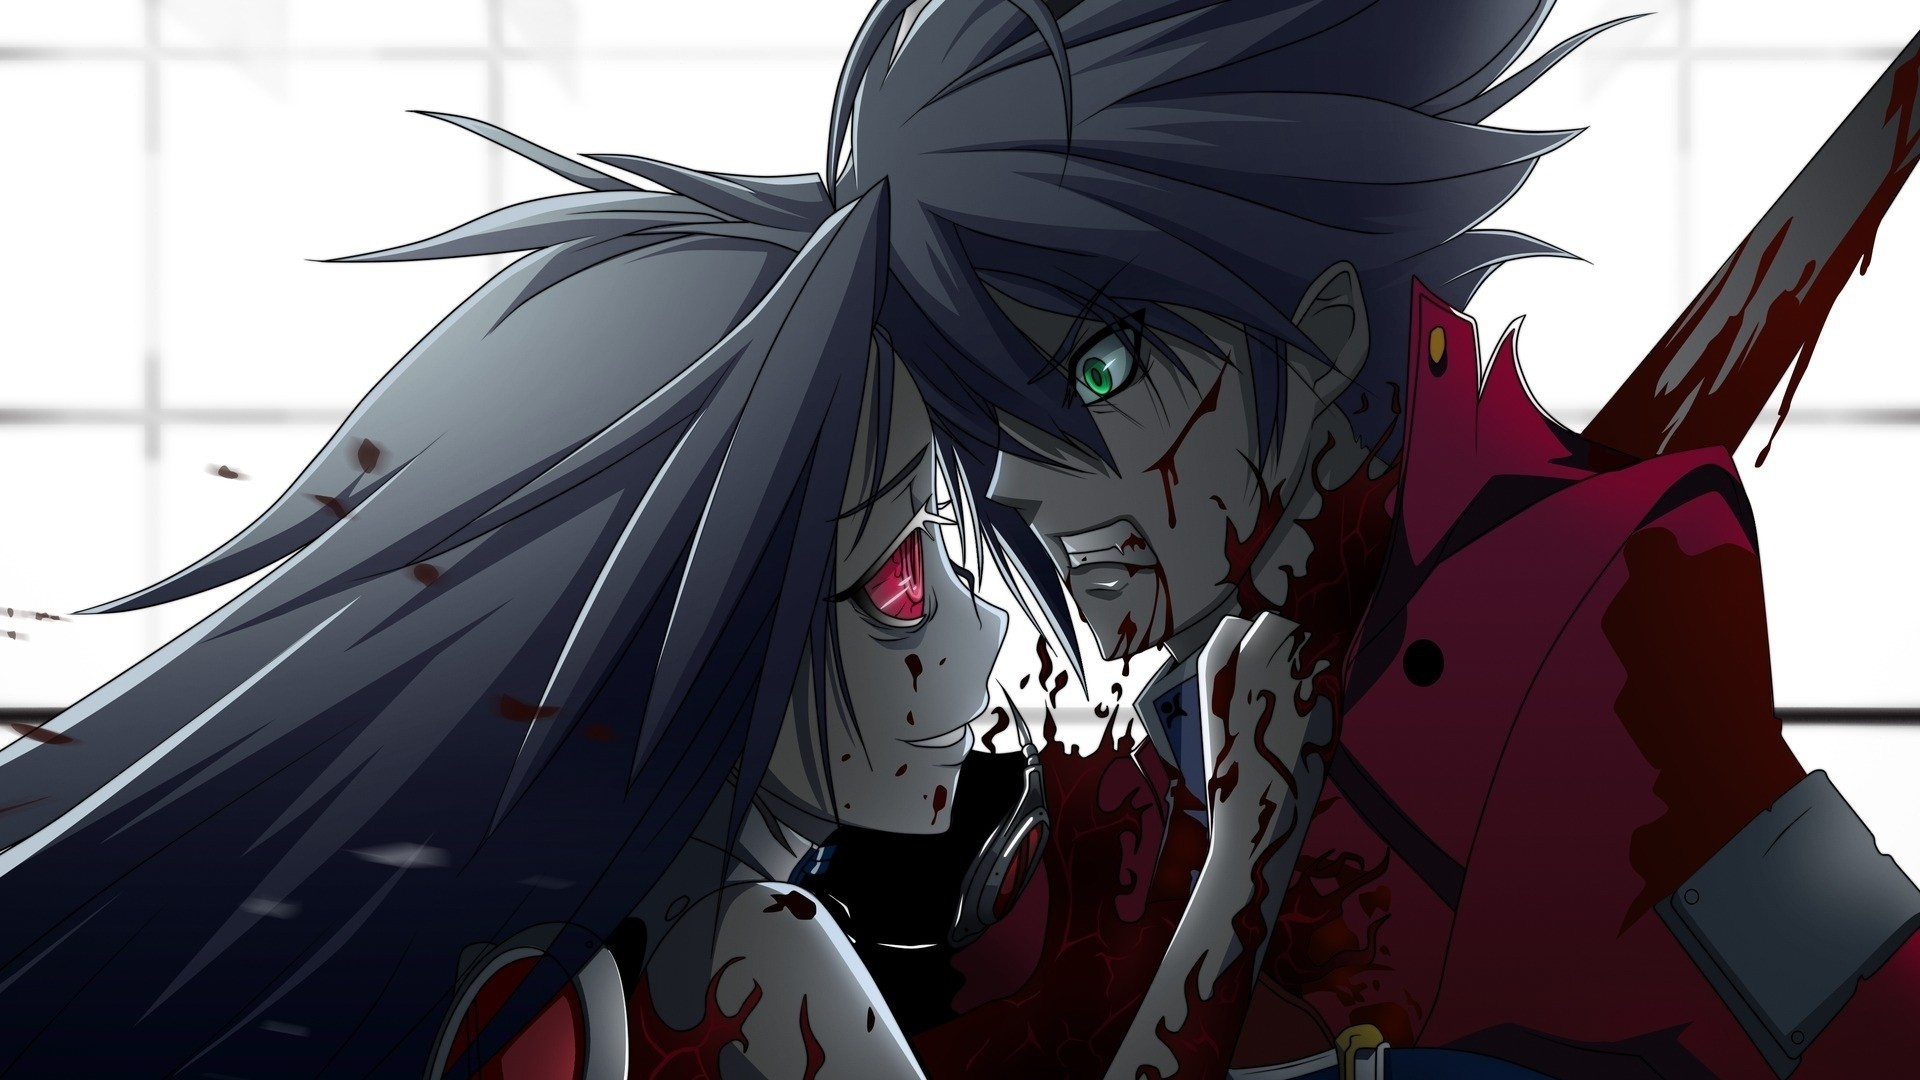 Anime Girl HD Wallpaper 1080p 83 Images